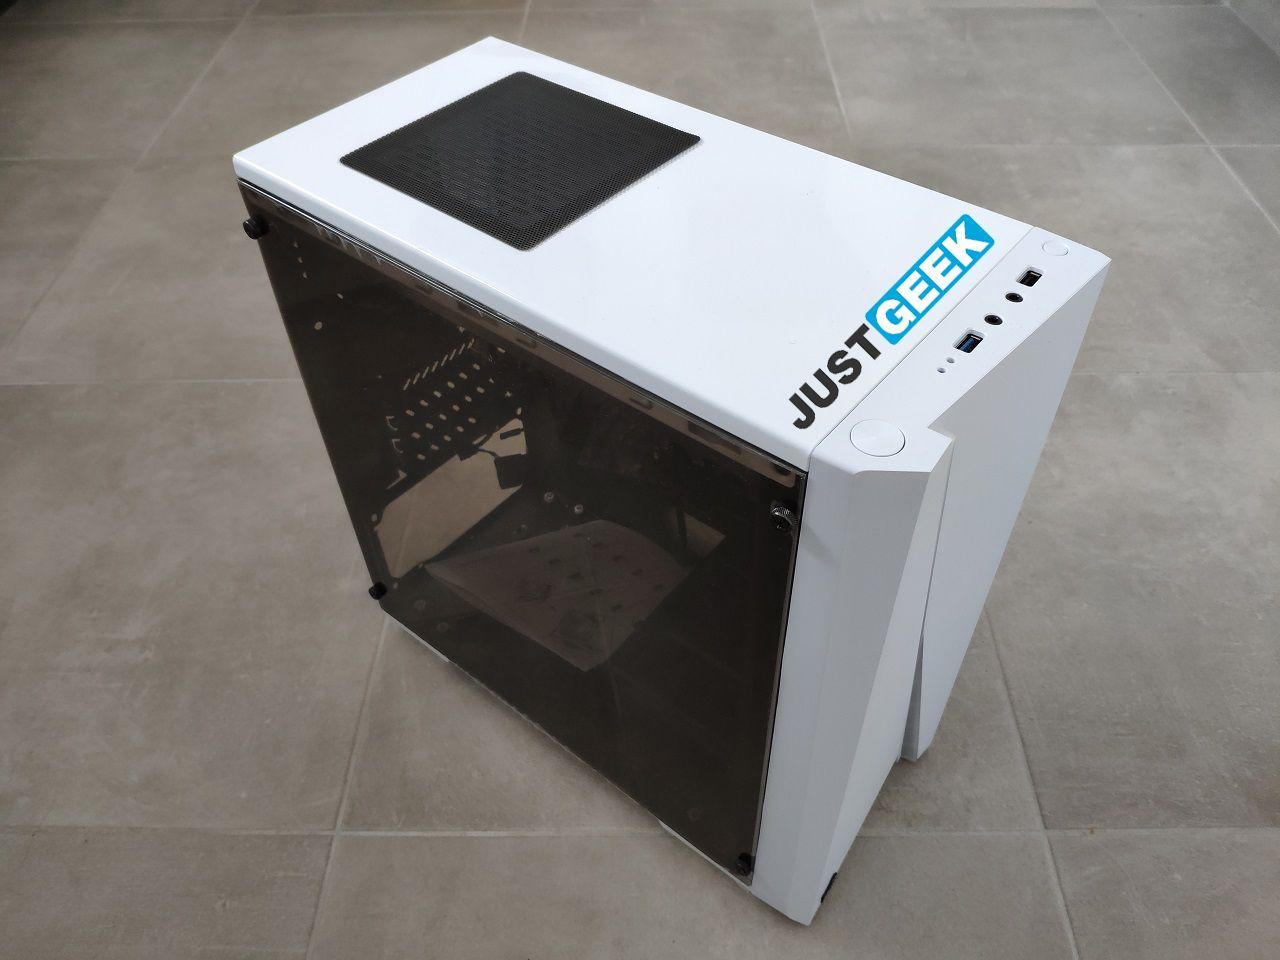 Tutoriel montage PC : Boîtier PC Aerocool Cylon Mini